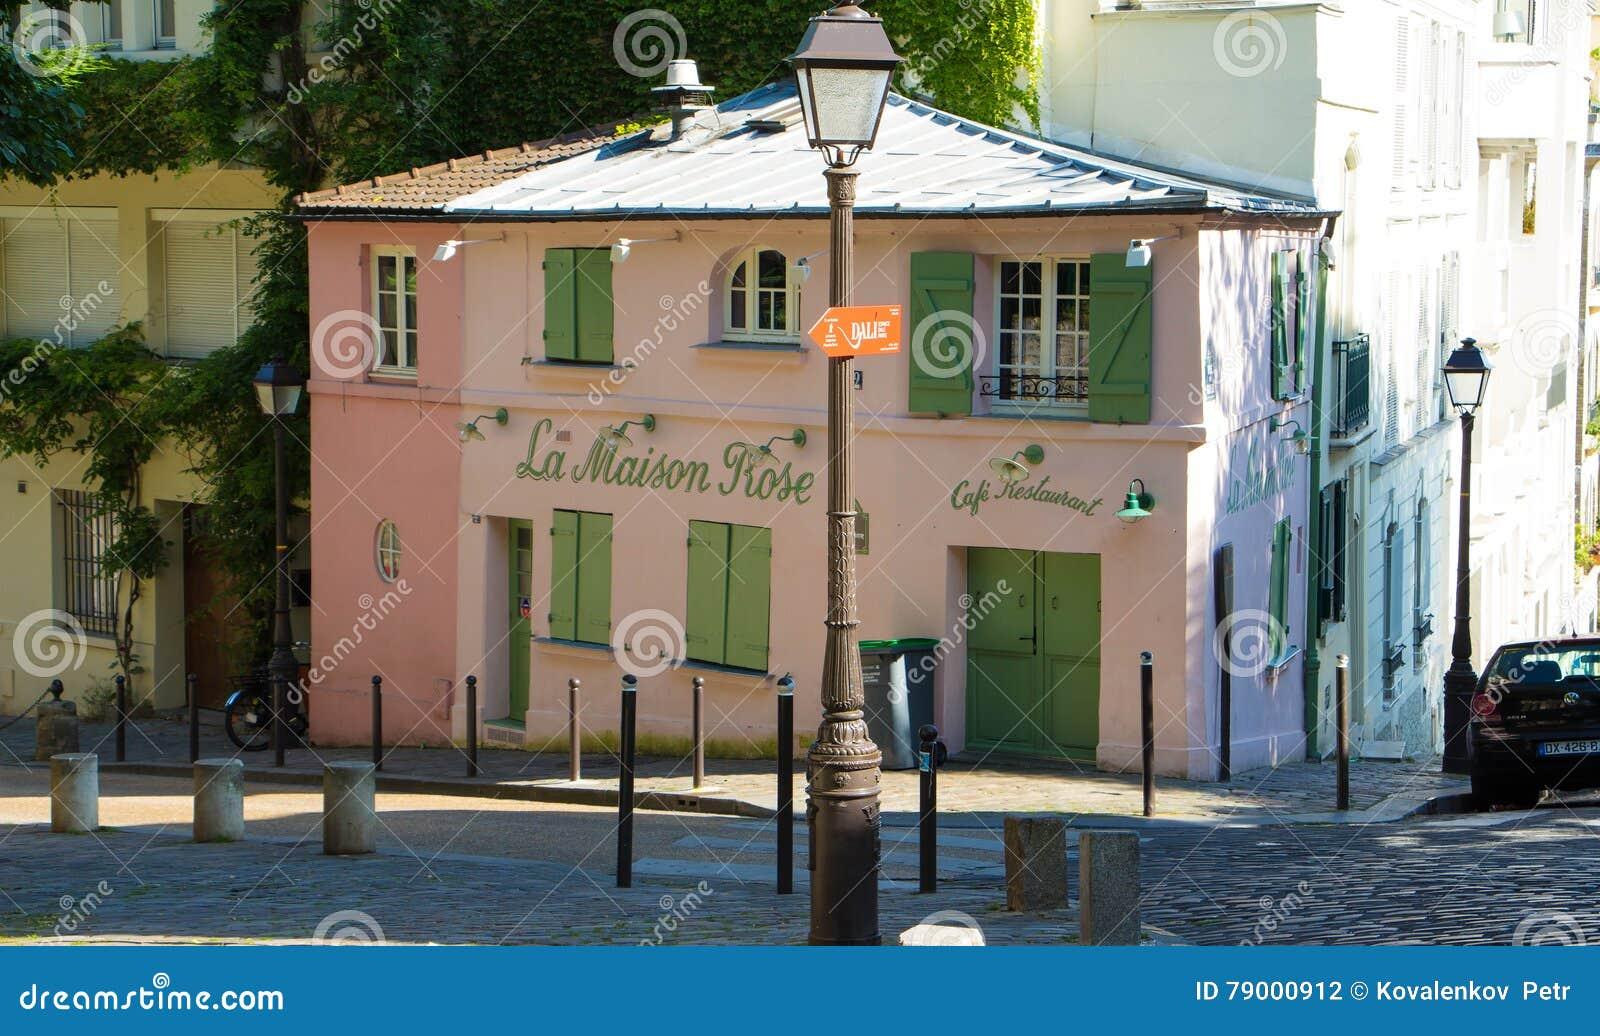 Paris france july 09 2016 the traditionnal french restaurant la maison rose located in picturesque montmartre district of paris